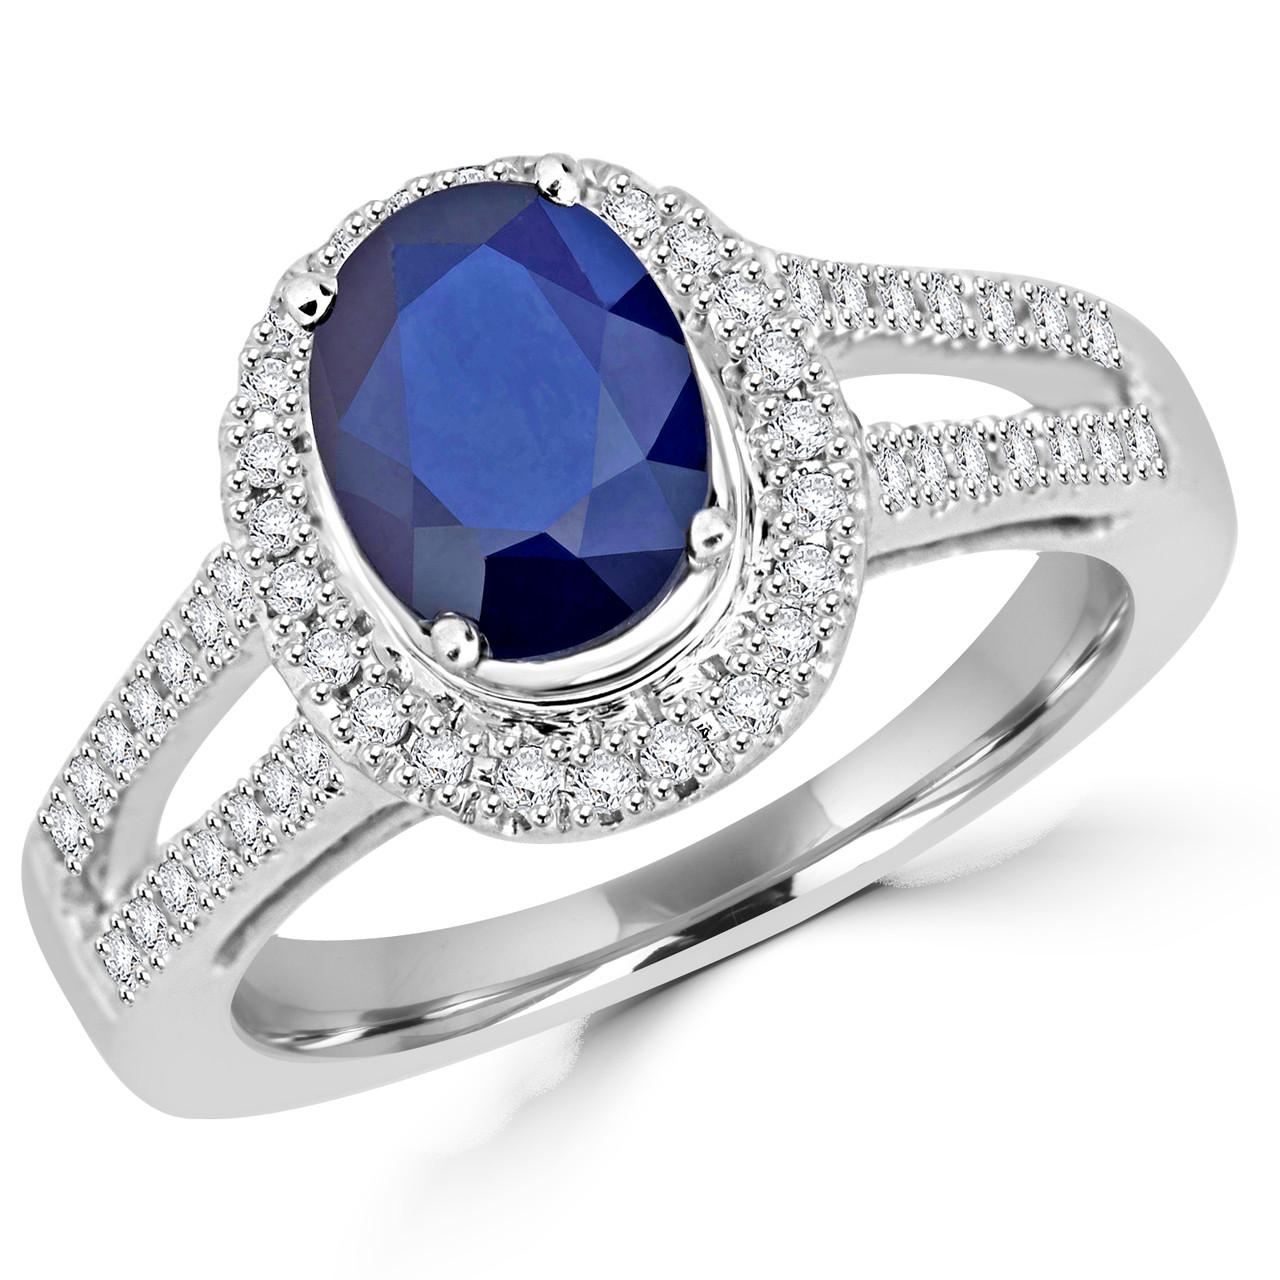 dd76452e7afb9 Oval Cut Sapphire Ring | Bijoux Majesty